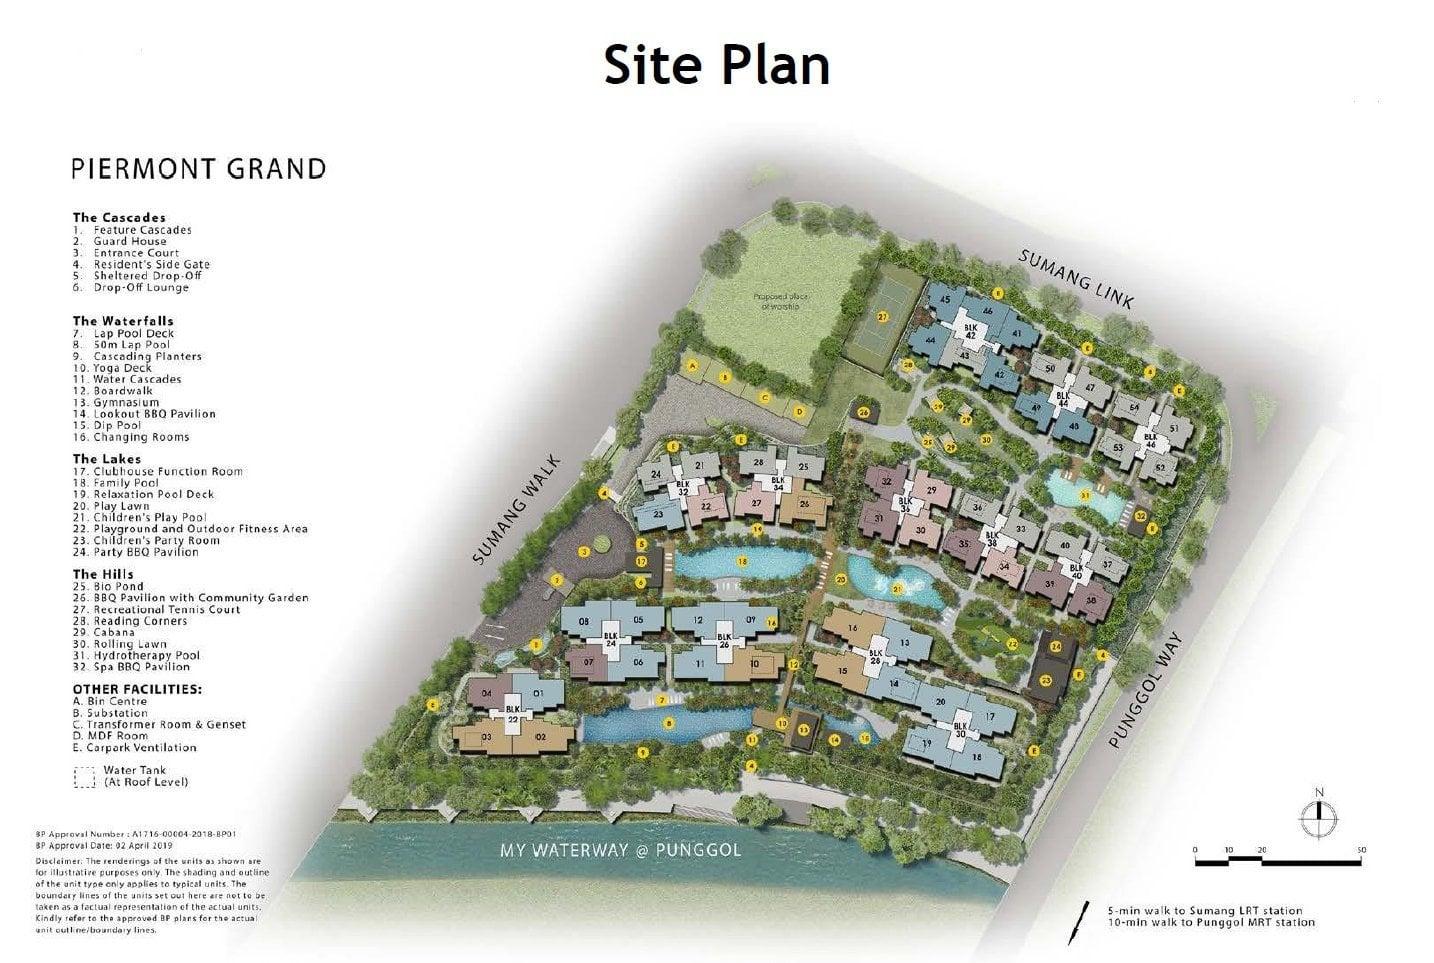 Piermont-Grand-site-plan